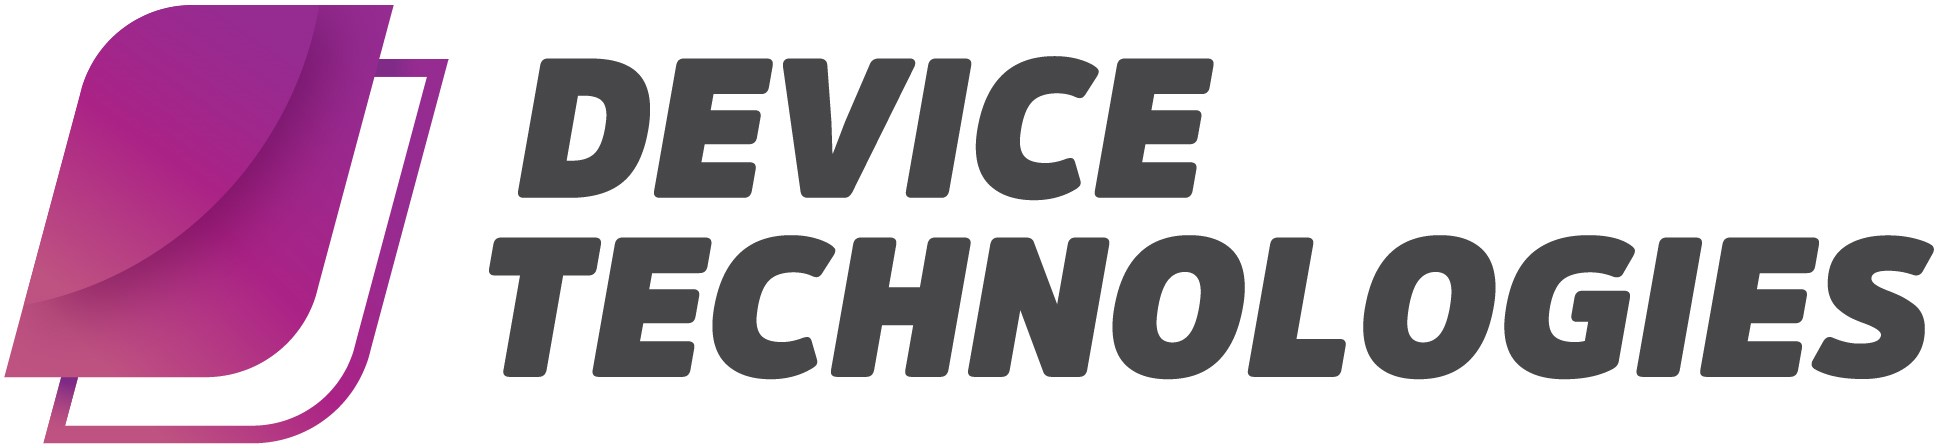 device-technologies